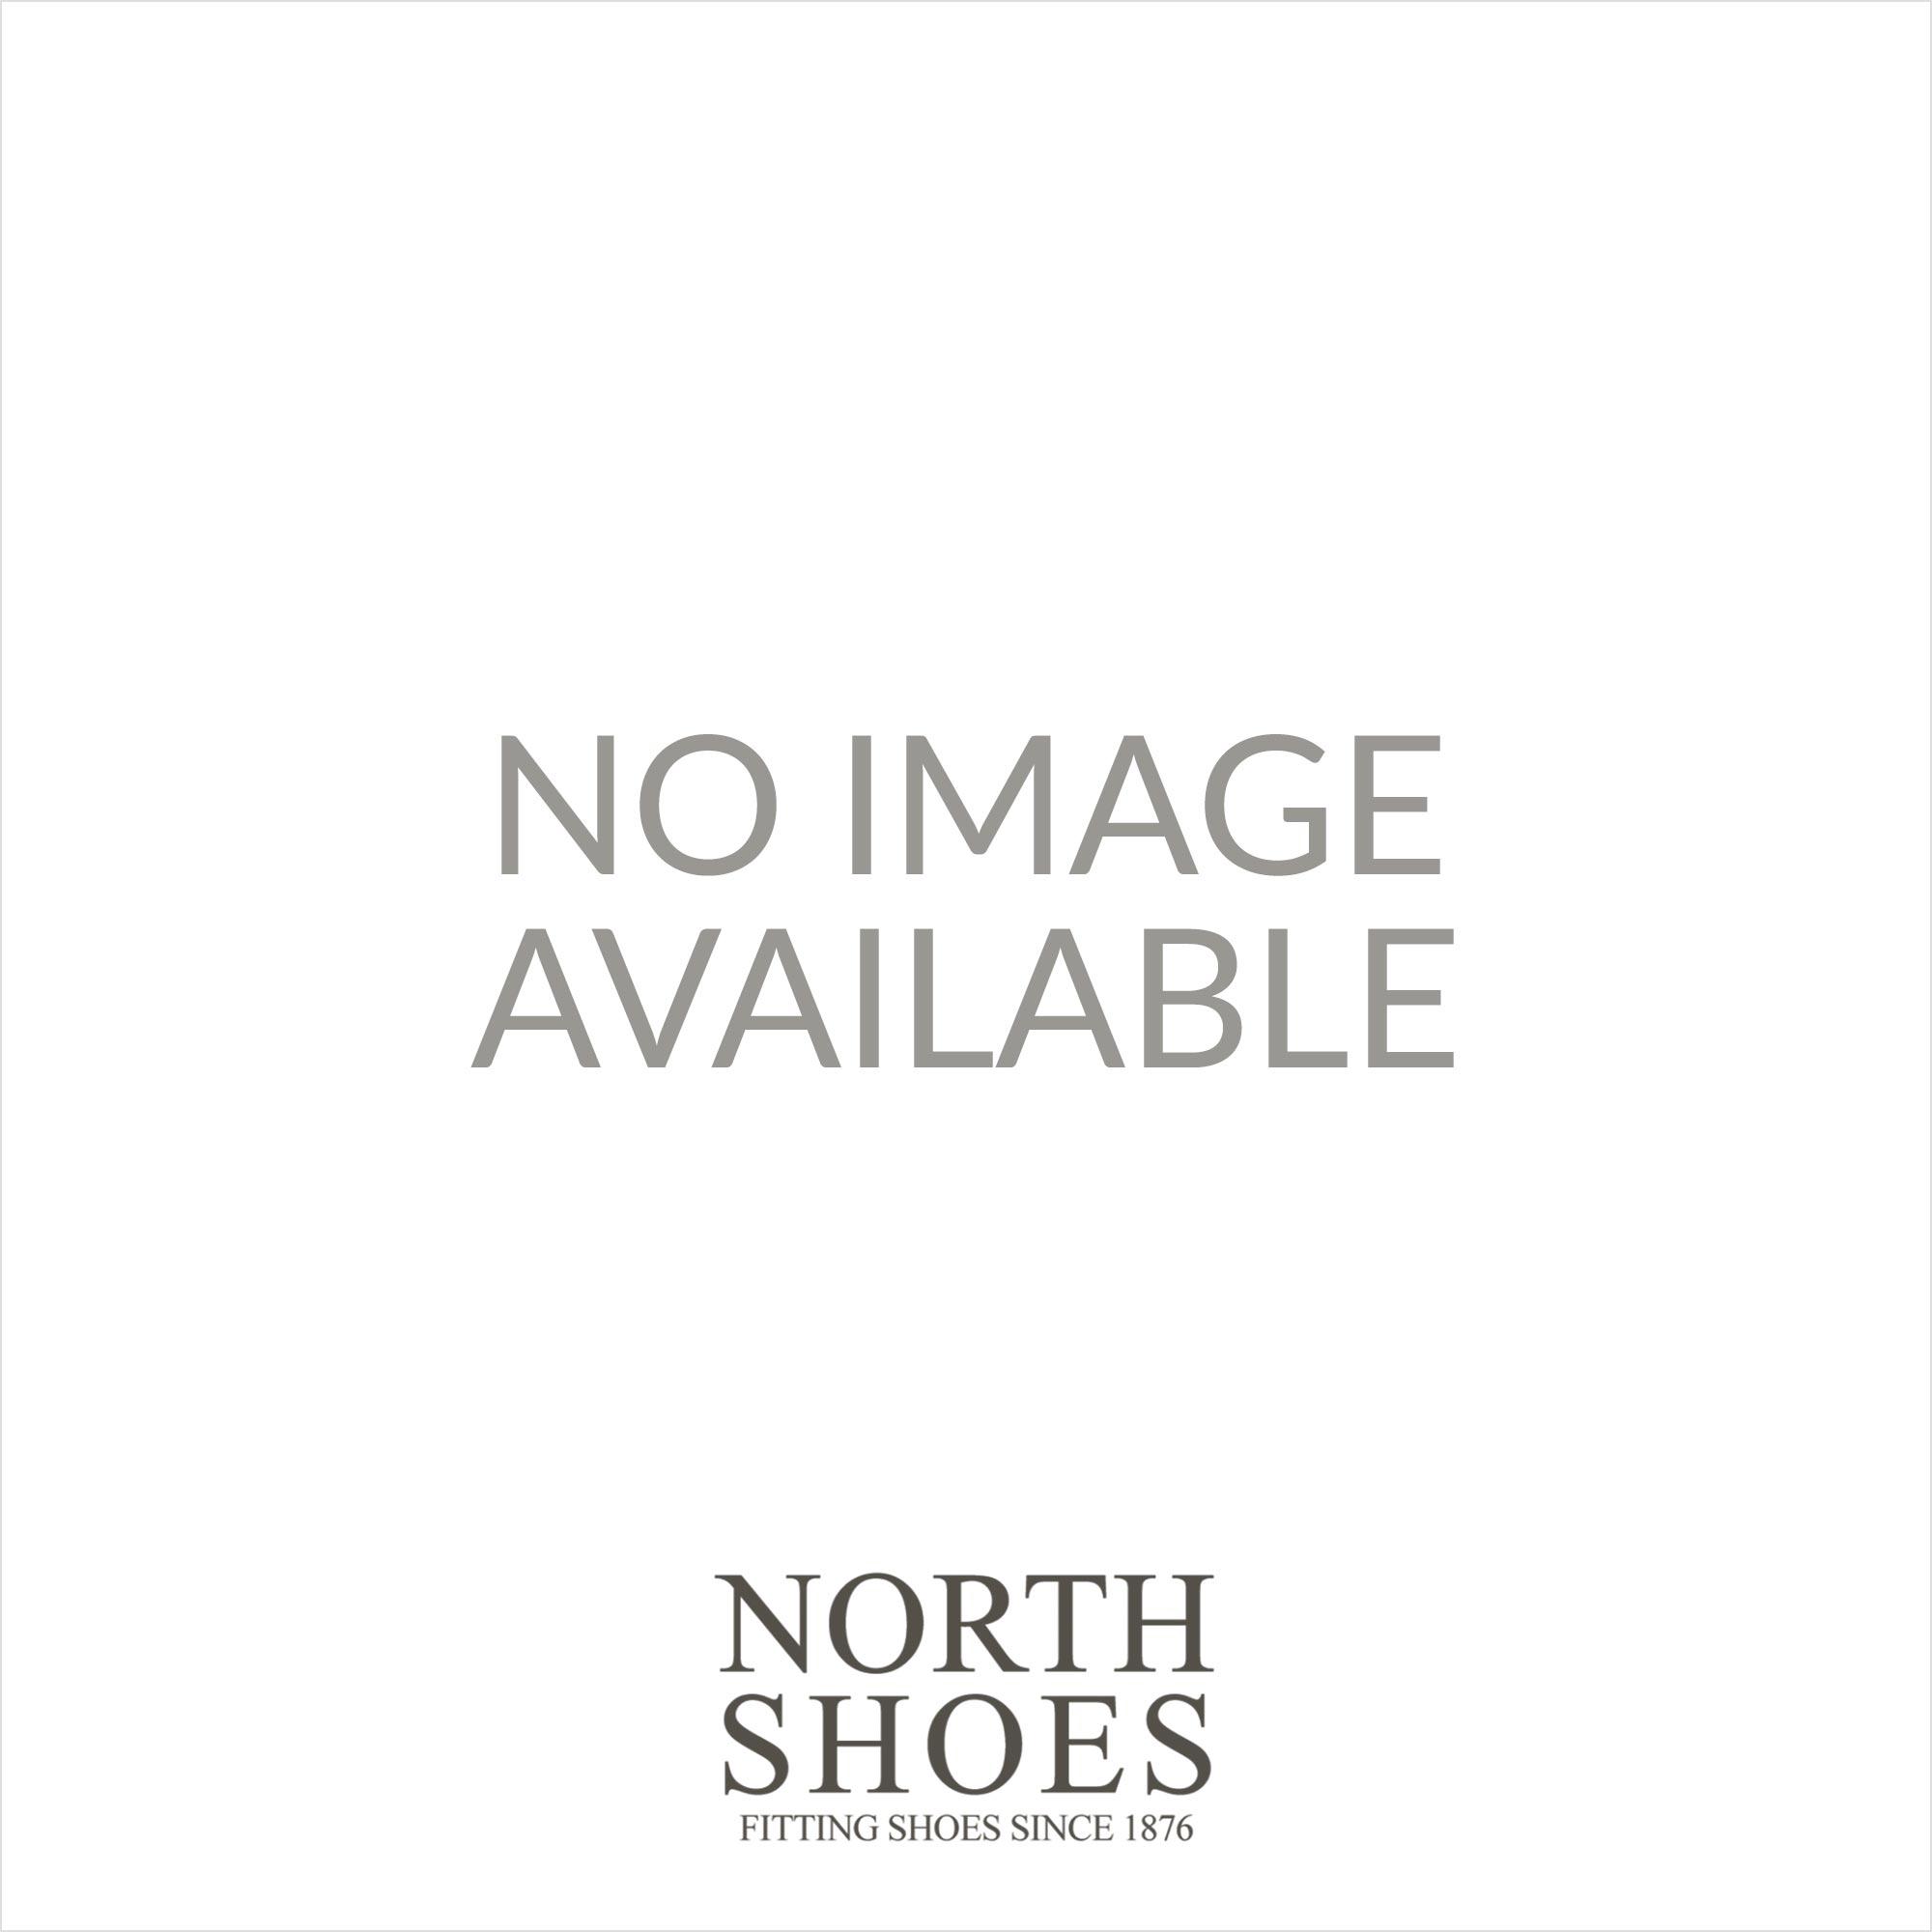 442bd8a92b5 Caprice 22415-20 Navy Leather Womens Slip On Kitten Heel Court Shoes - UK 4